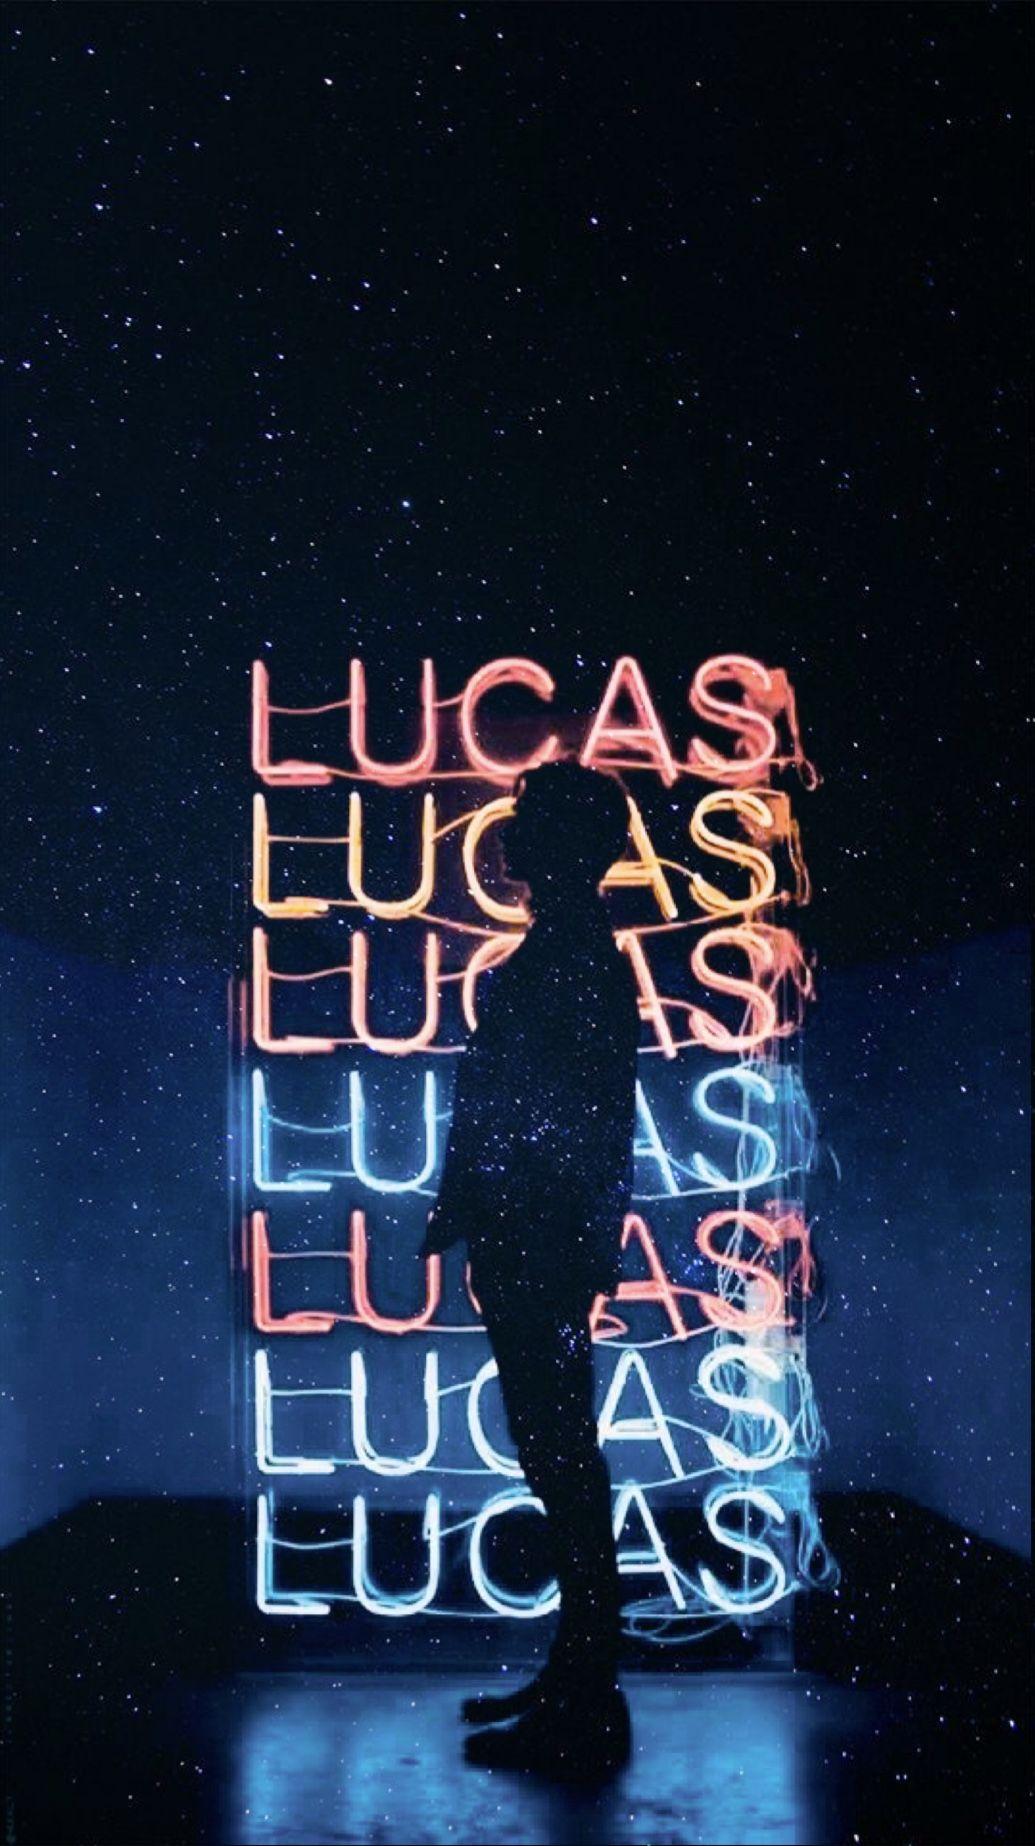 #nct2018 #nct Lucas   NCT wallpaper   NCT, Nct 127, dan Lucas nct